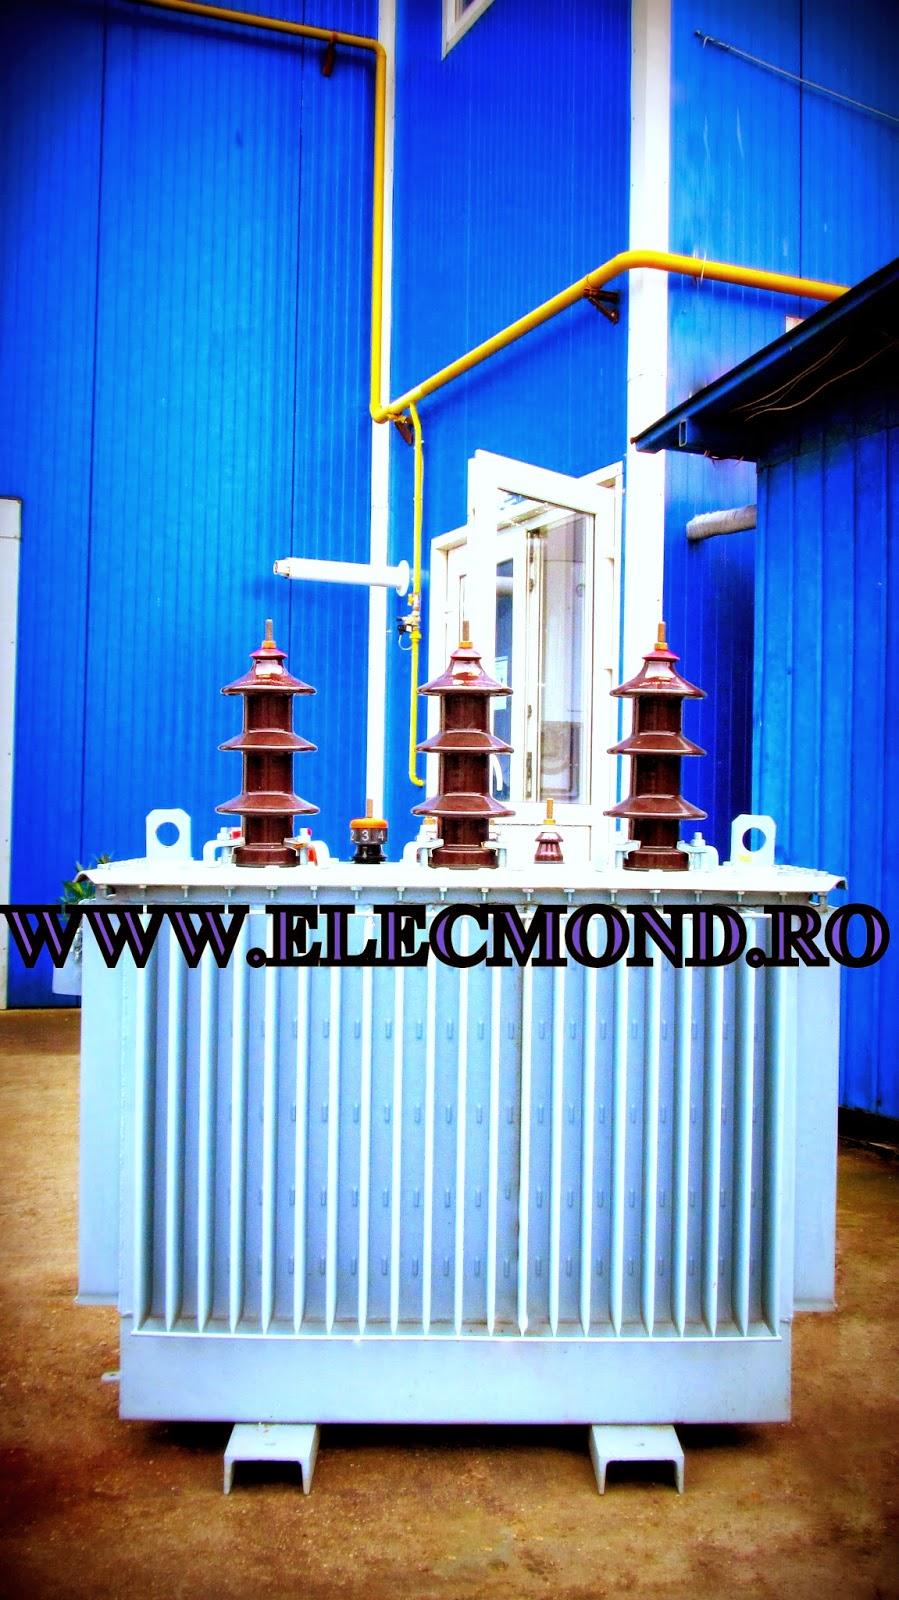 TRANSFORMATOARE NOI , Transformator 1000  , transformator 1000 kVA , transformator 1600 kVA , transformatoare din stoc , transformatoare pe stoc , transformatoare ELECMOND ELECTRIC CRAIOVA  , ELECMOND BLOG